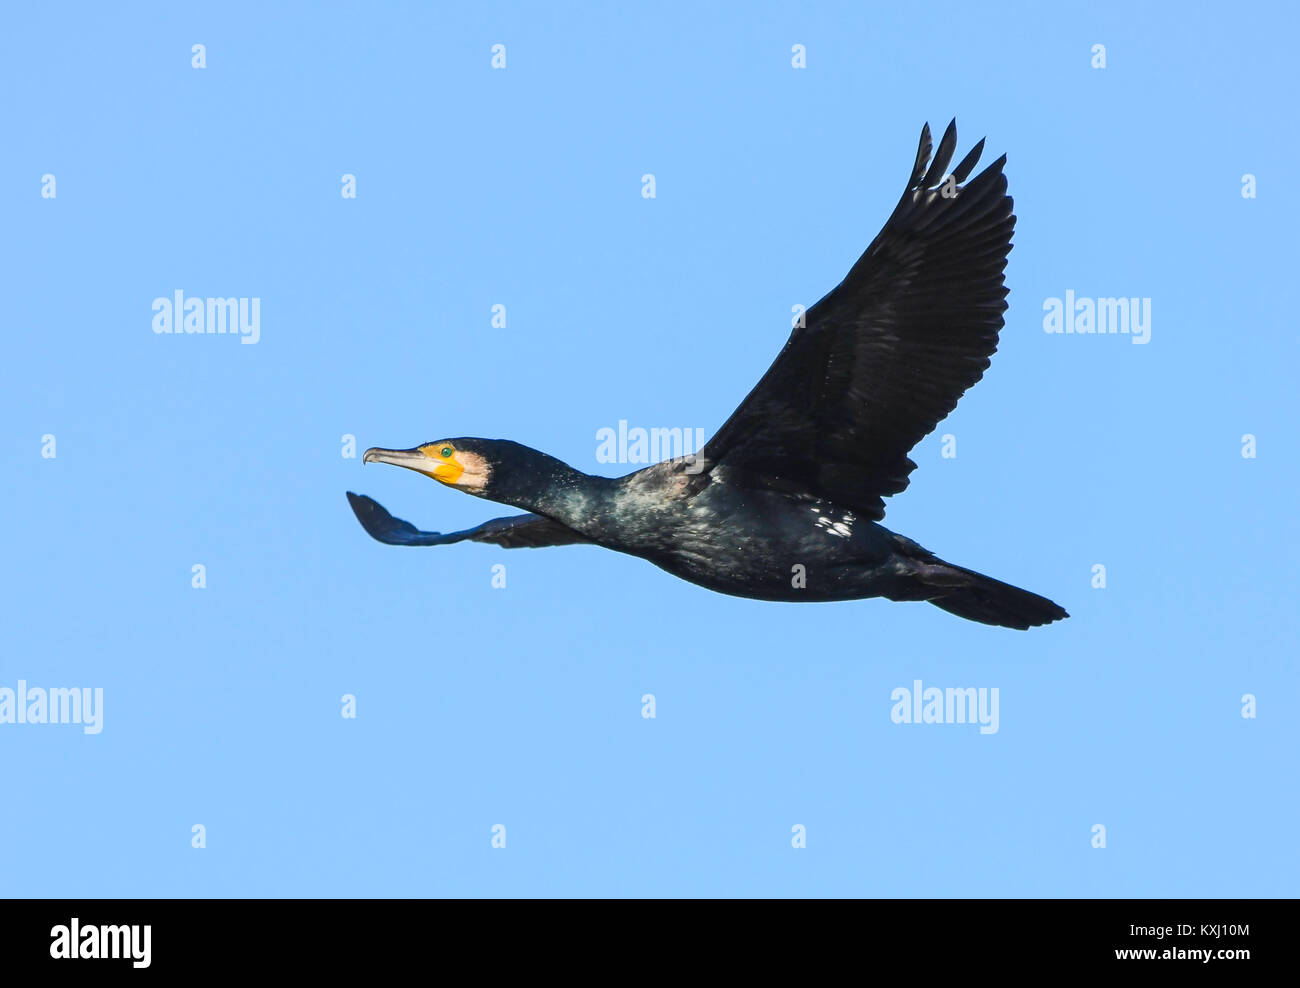 Cormoran in flight - Stock Image